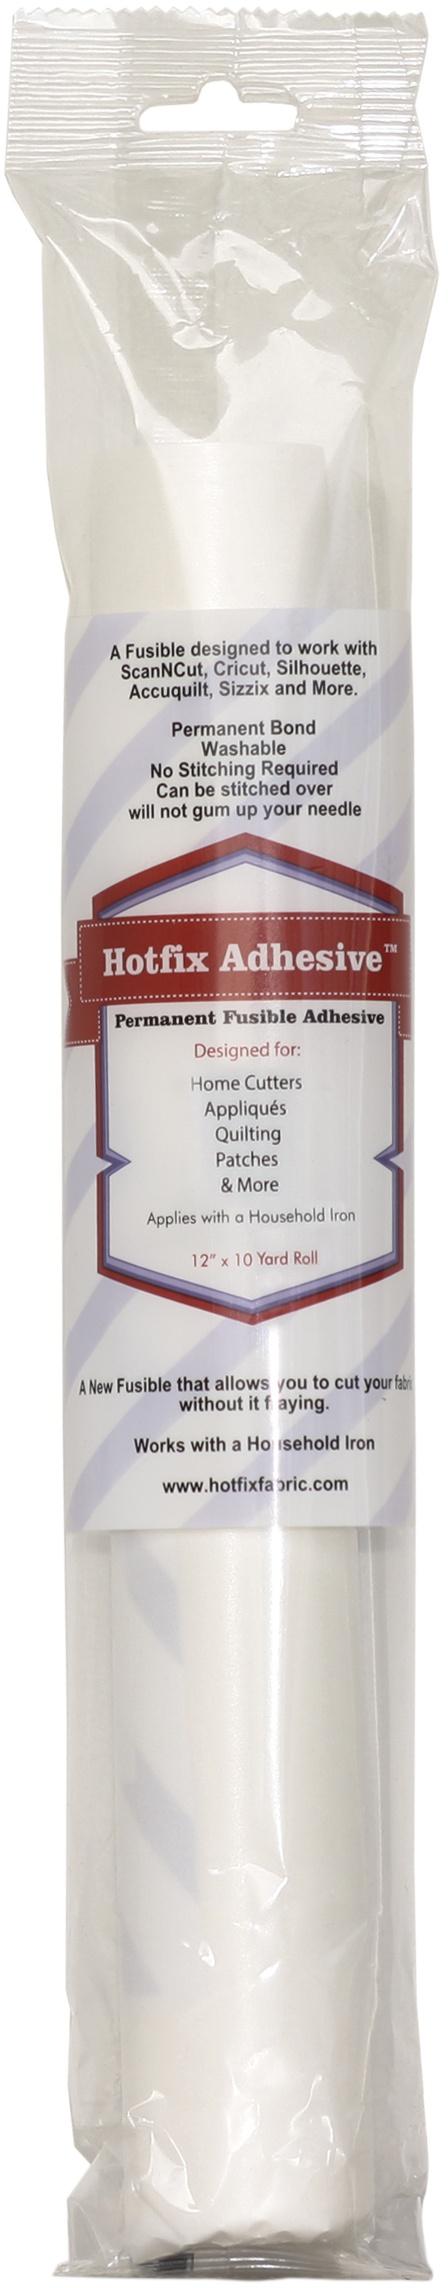 Hotfix Adhesive